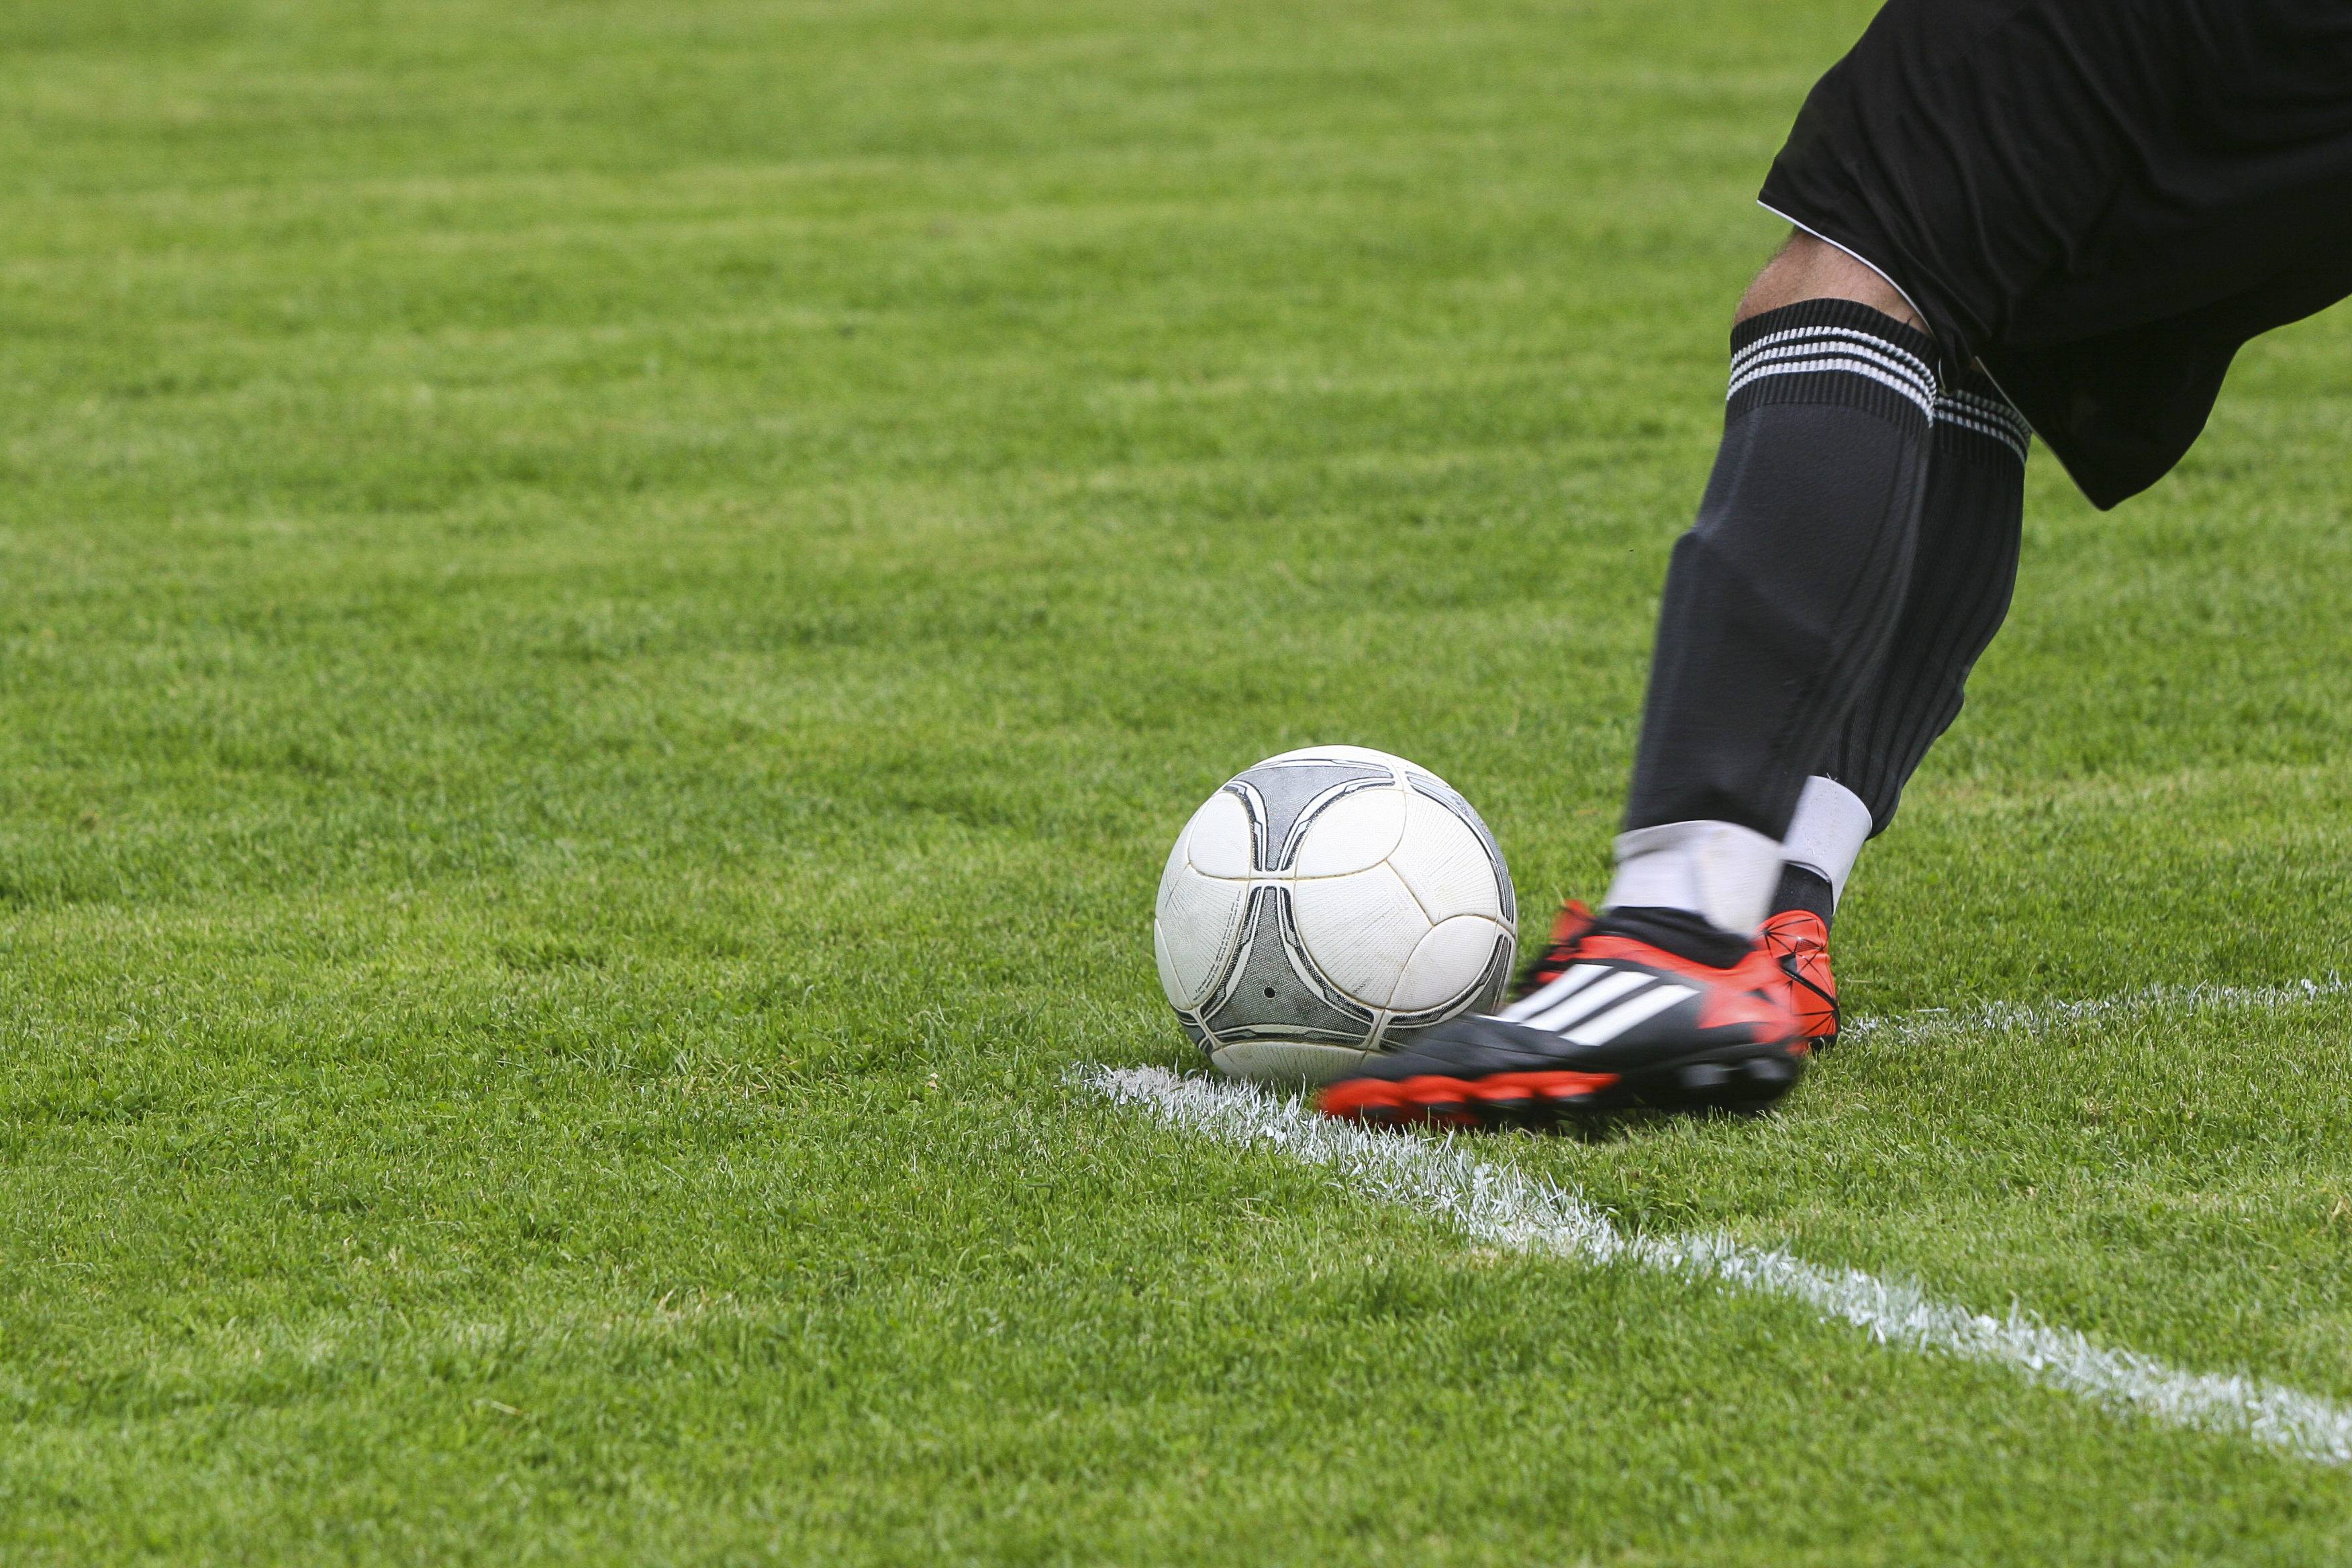 Soccer Player Kicking White Gray Soccer Ball on Green Grass Field